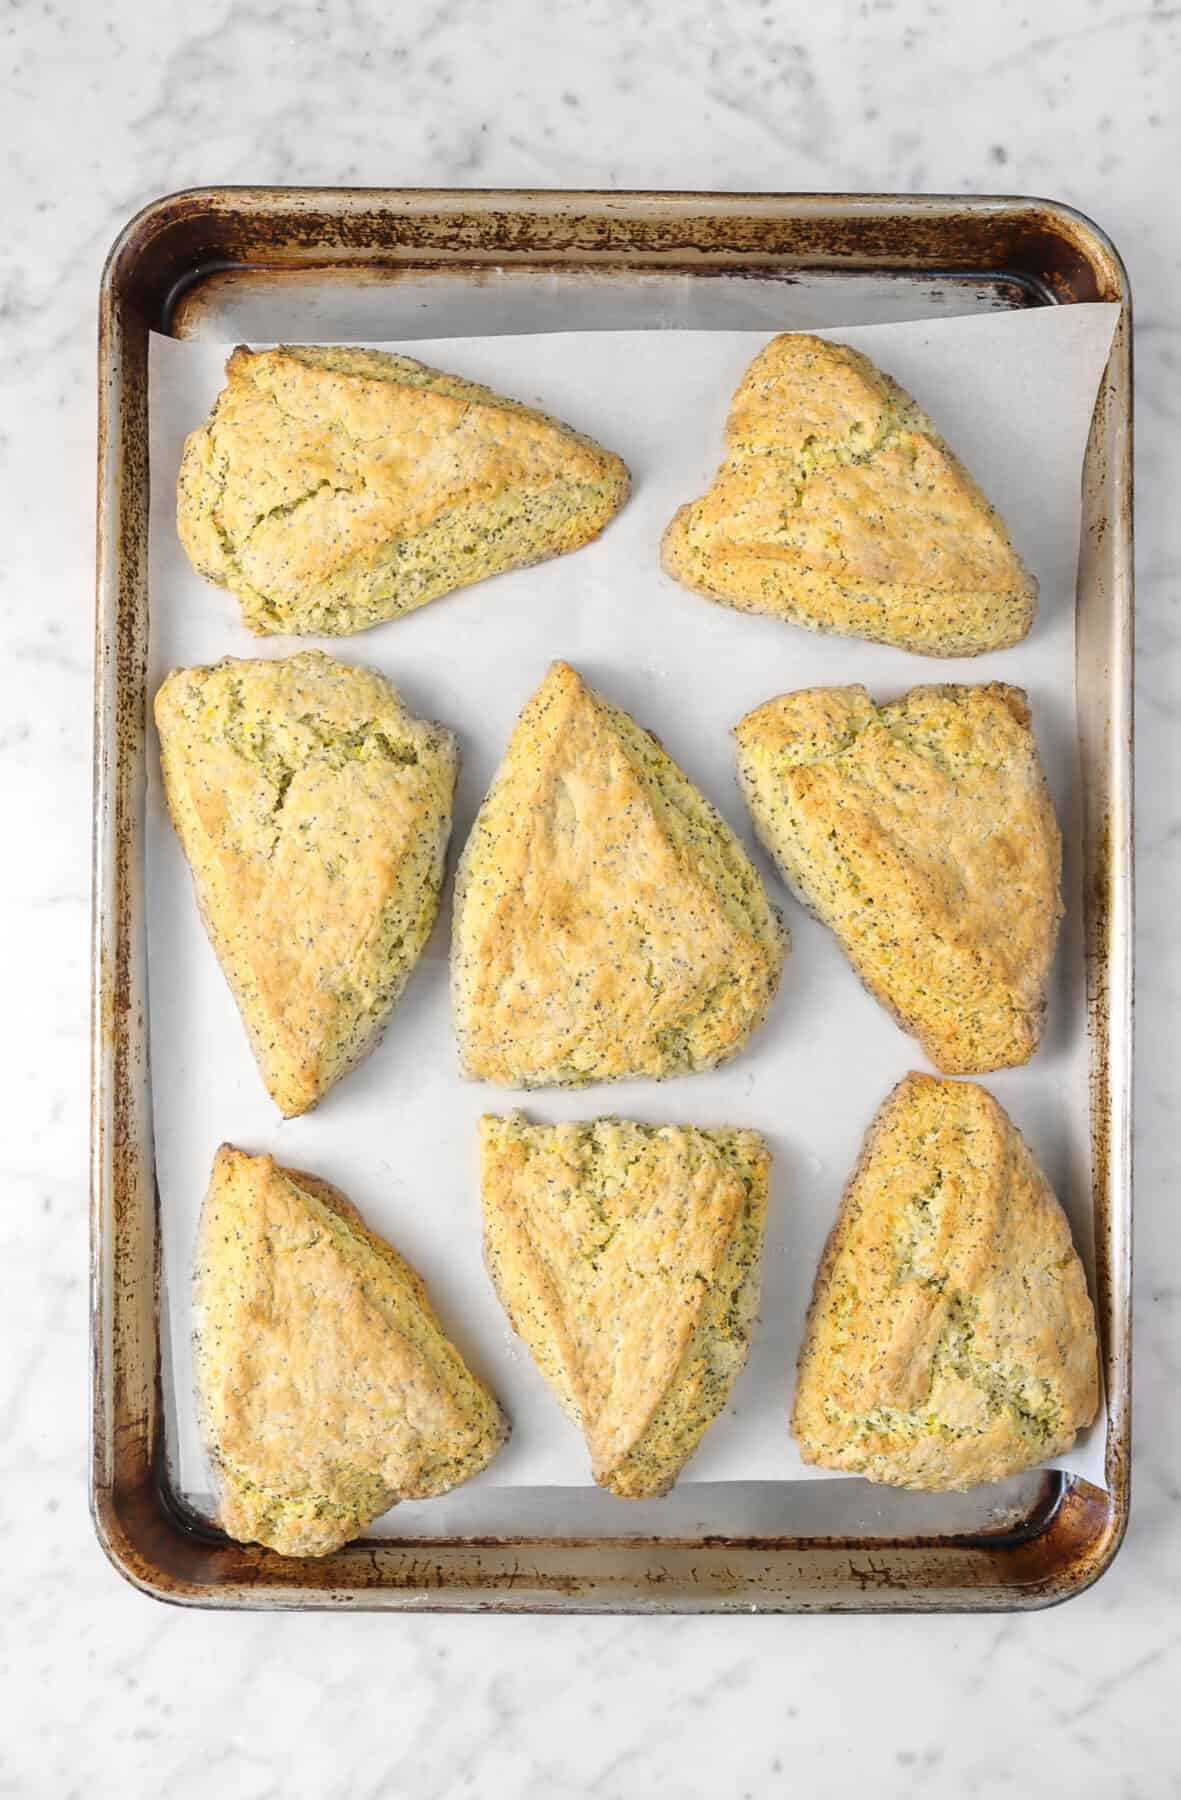 lemon poppyseed scones on a sheet pan